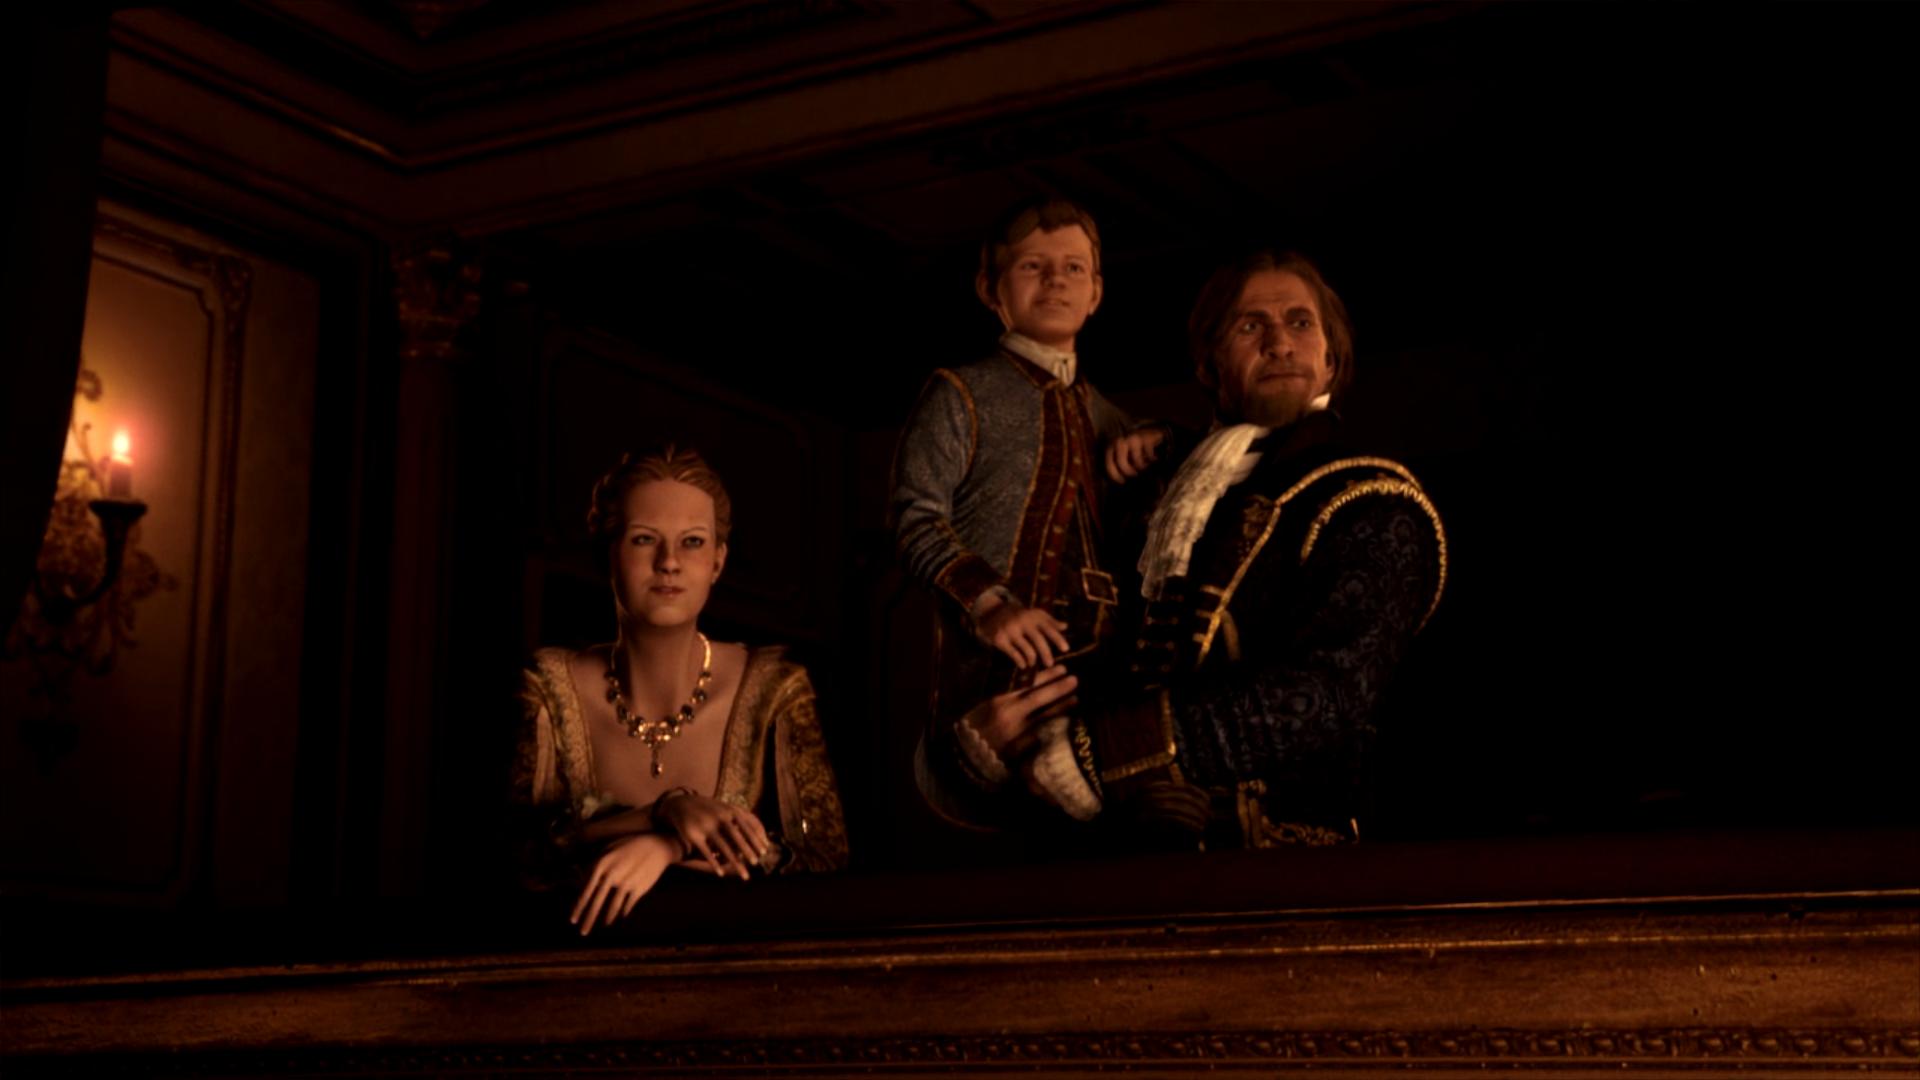 Kenway family   Assassin's Creed Wiki   Fandom